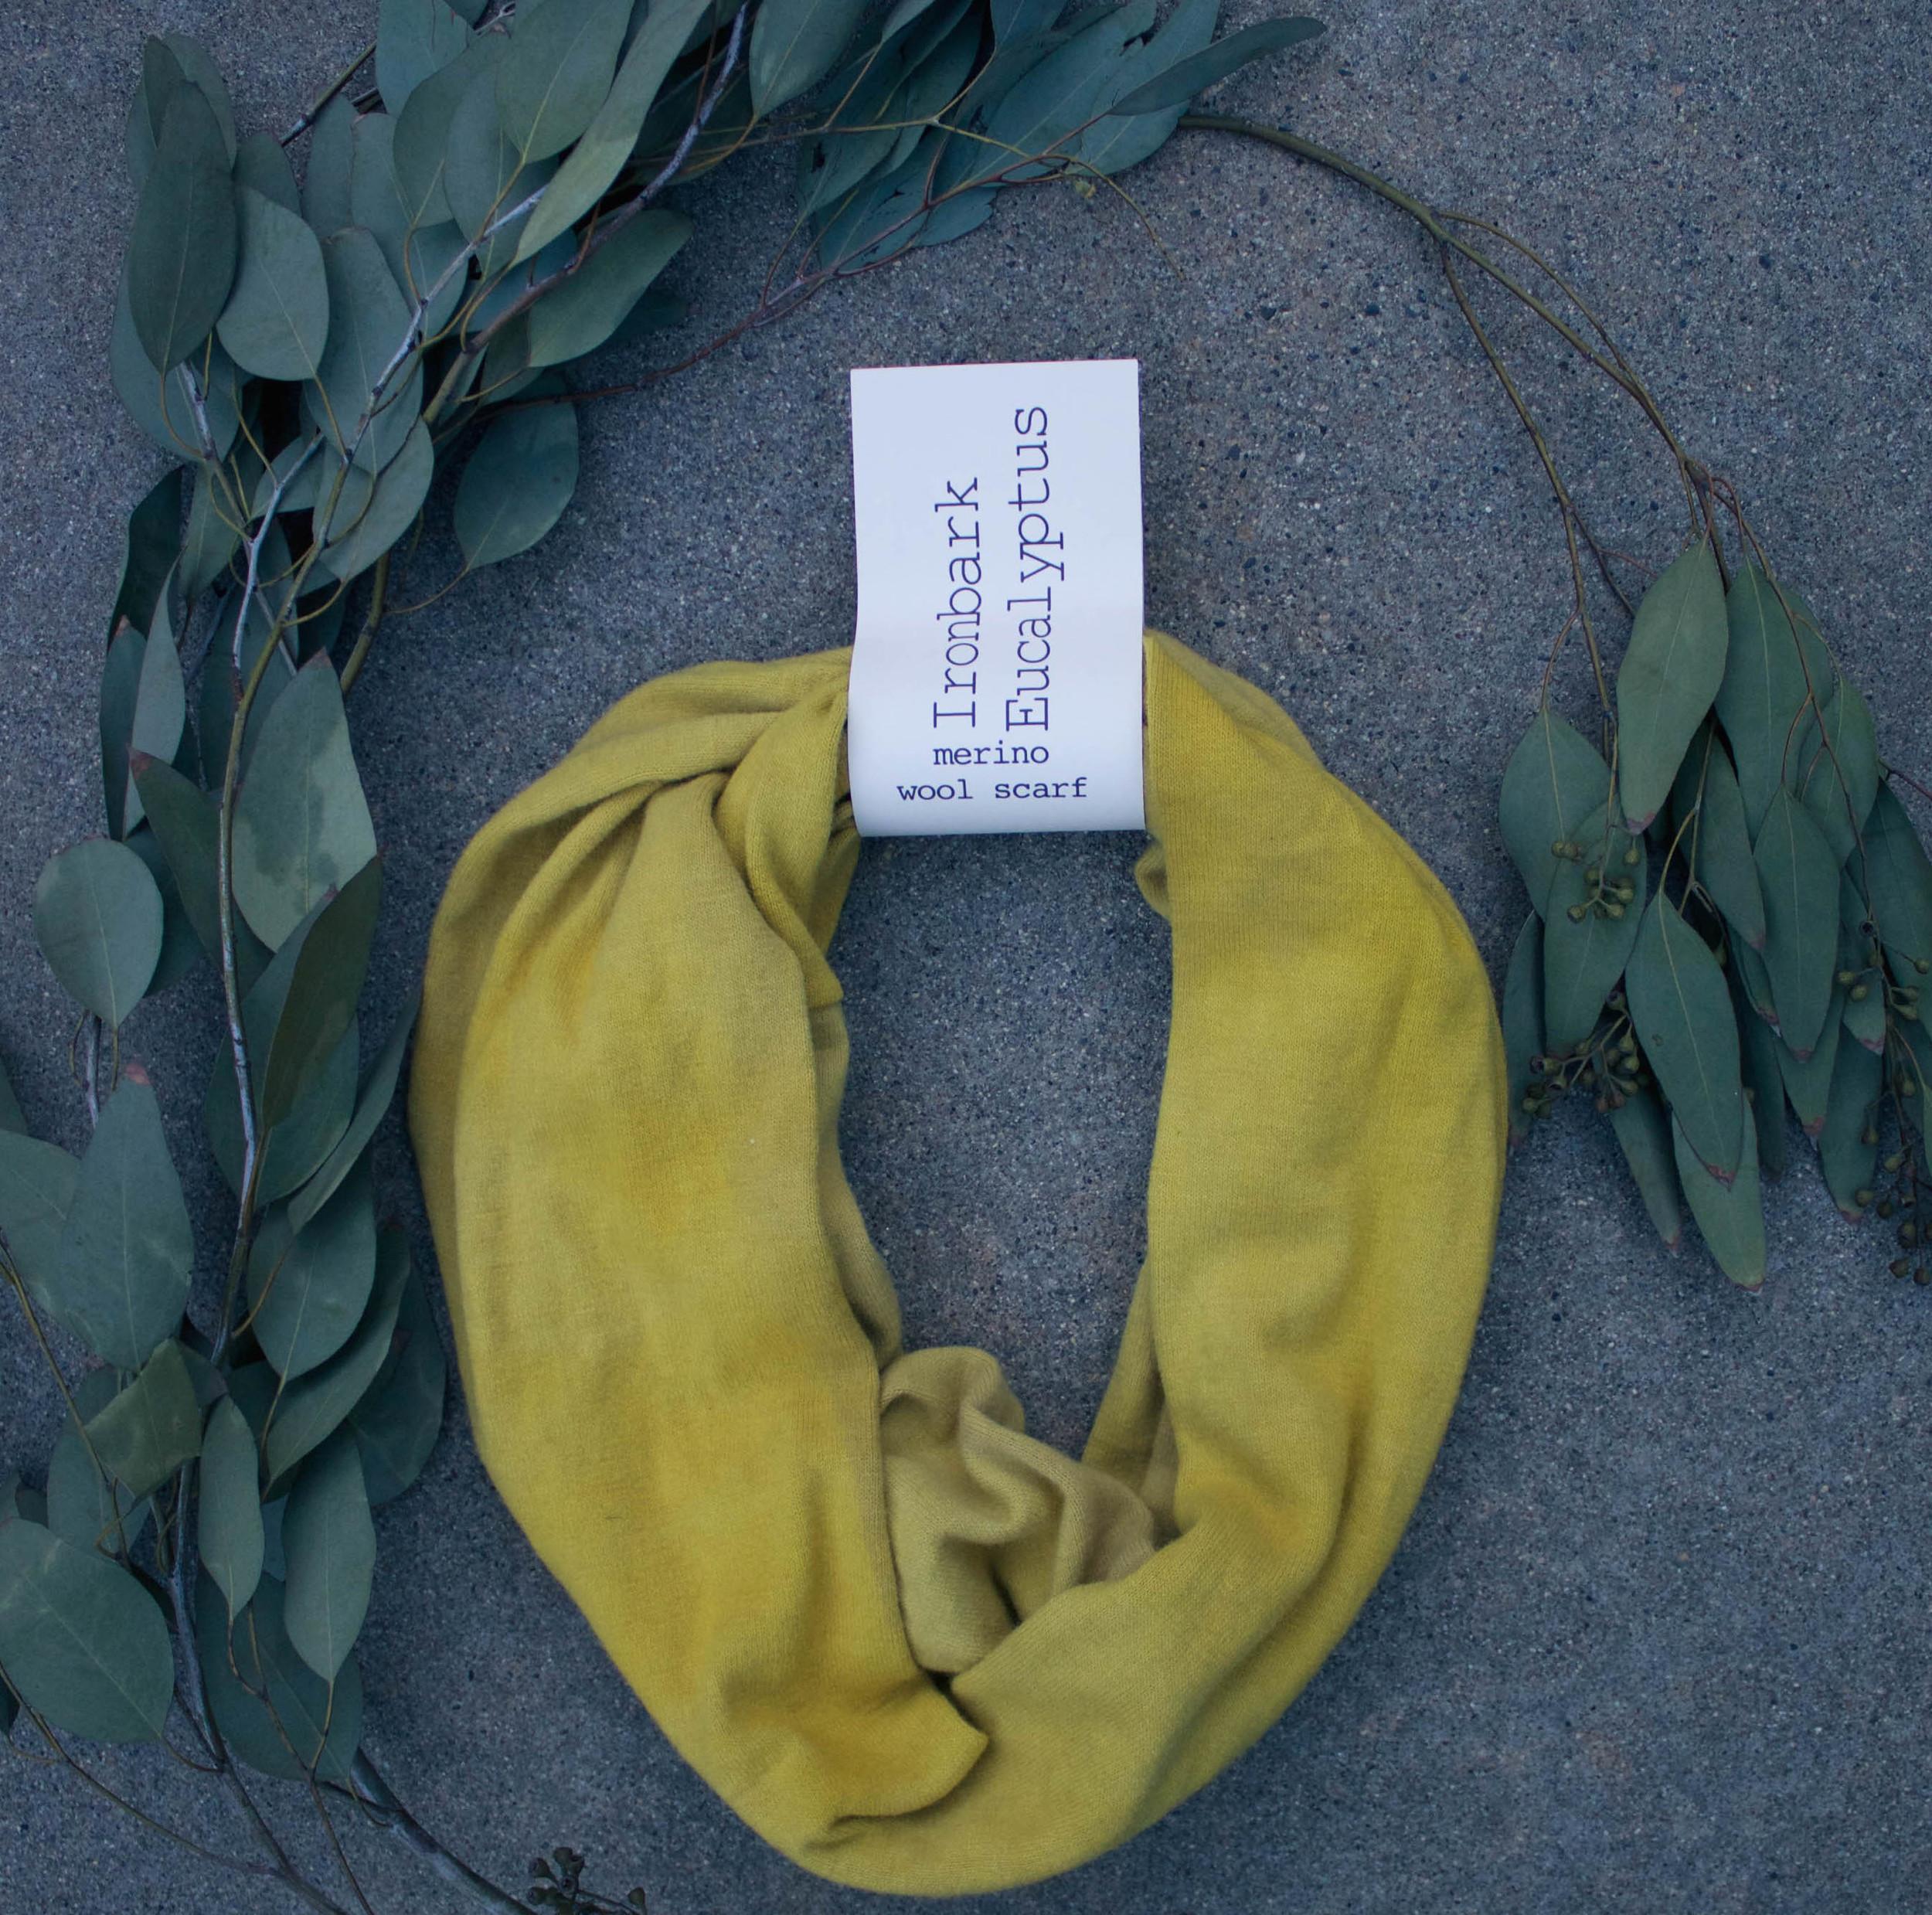 NATURALLY DYED WOOL SCARF //   Ironbark Eucalyptus   // $65